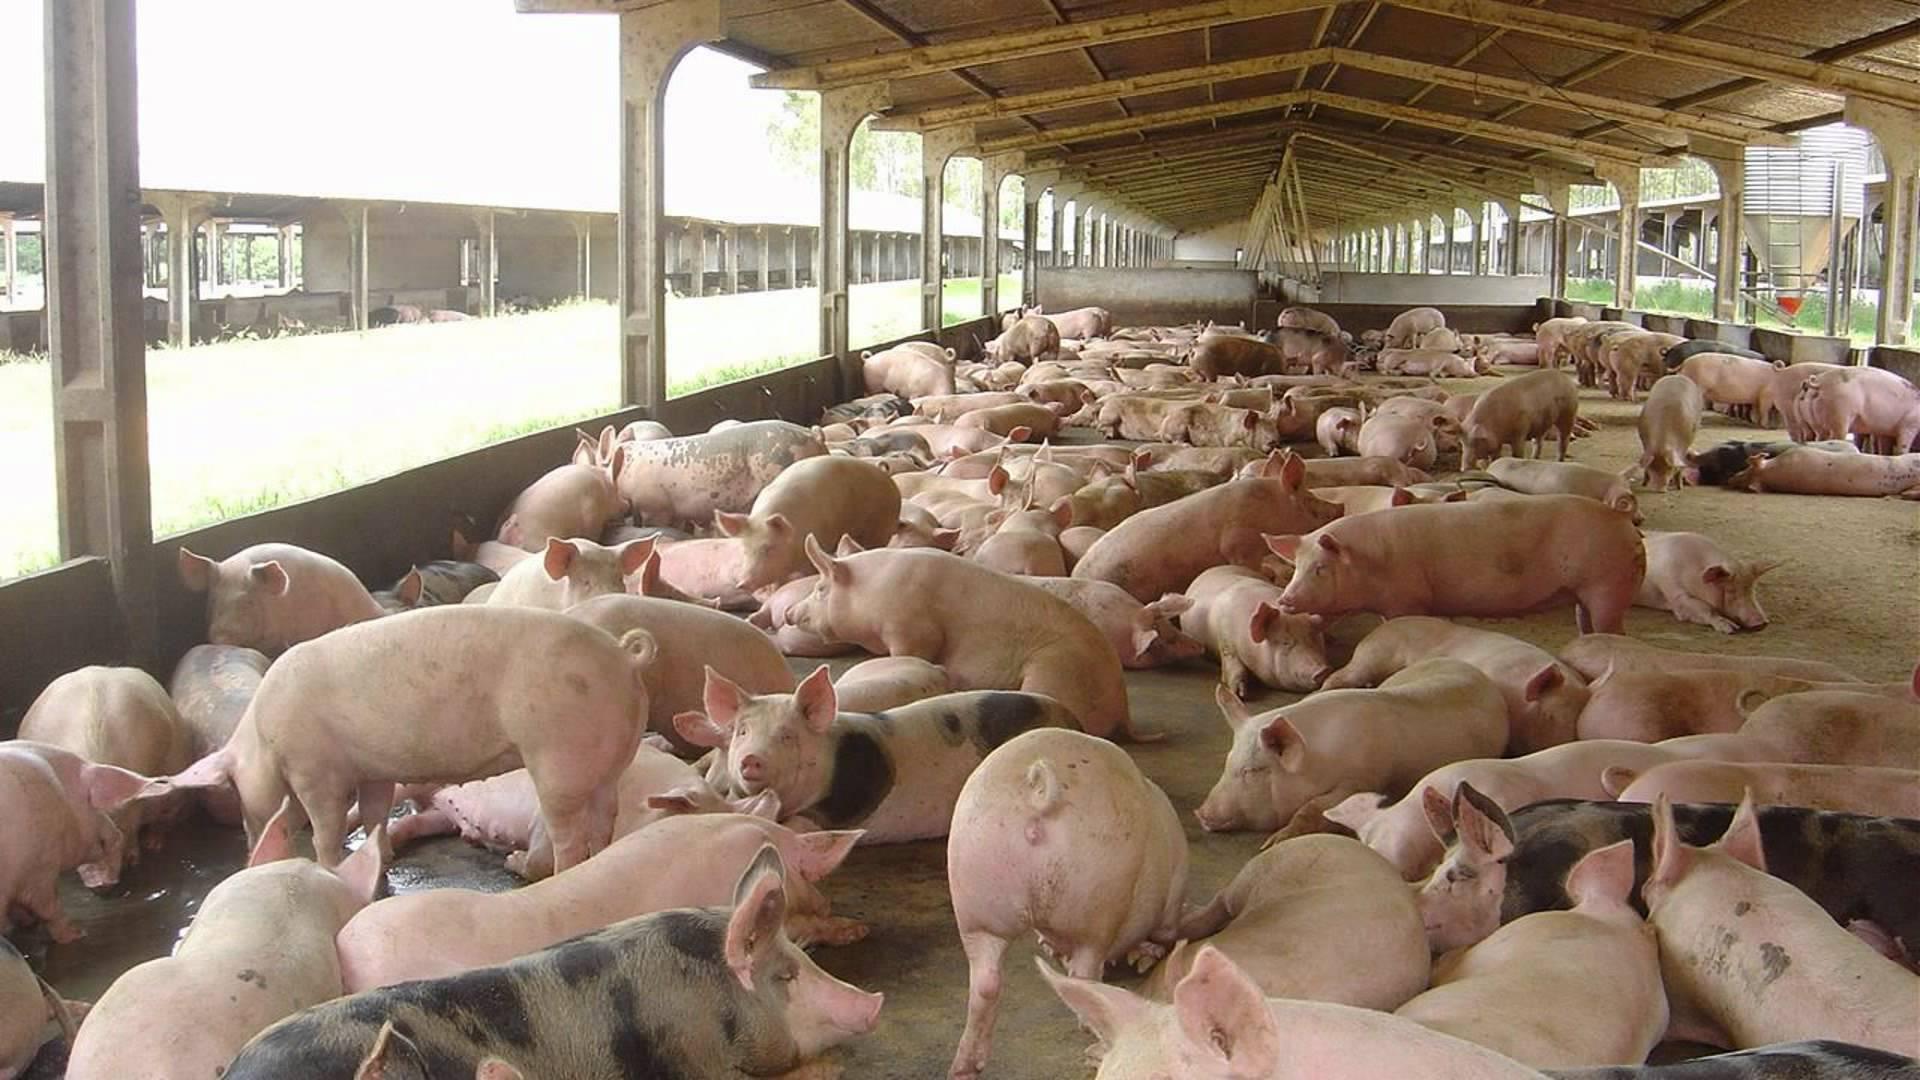 Venda de suínos vivos e abatidos